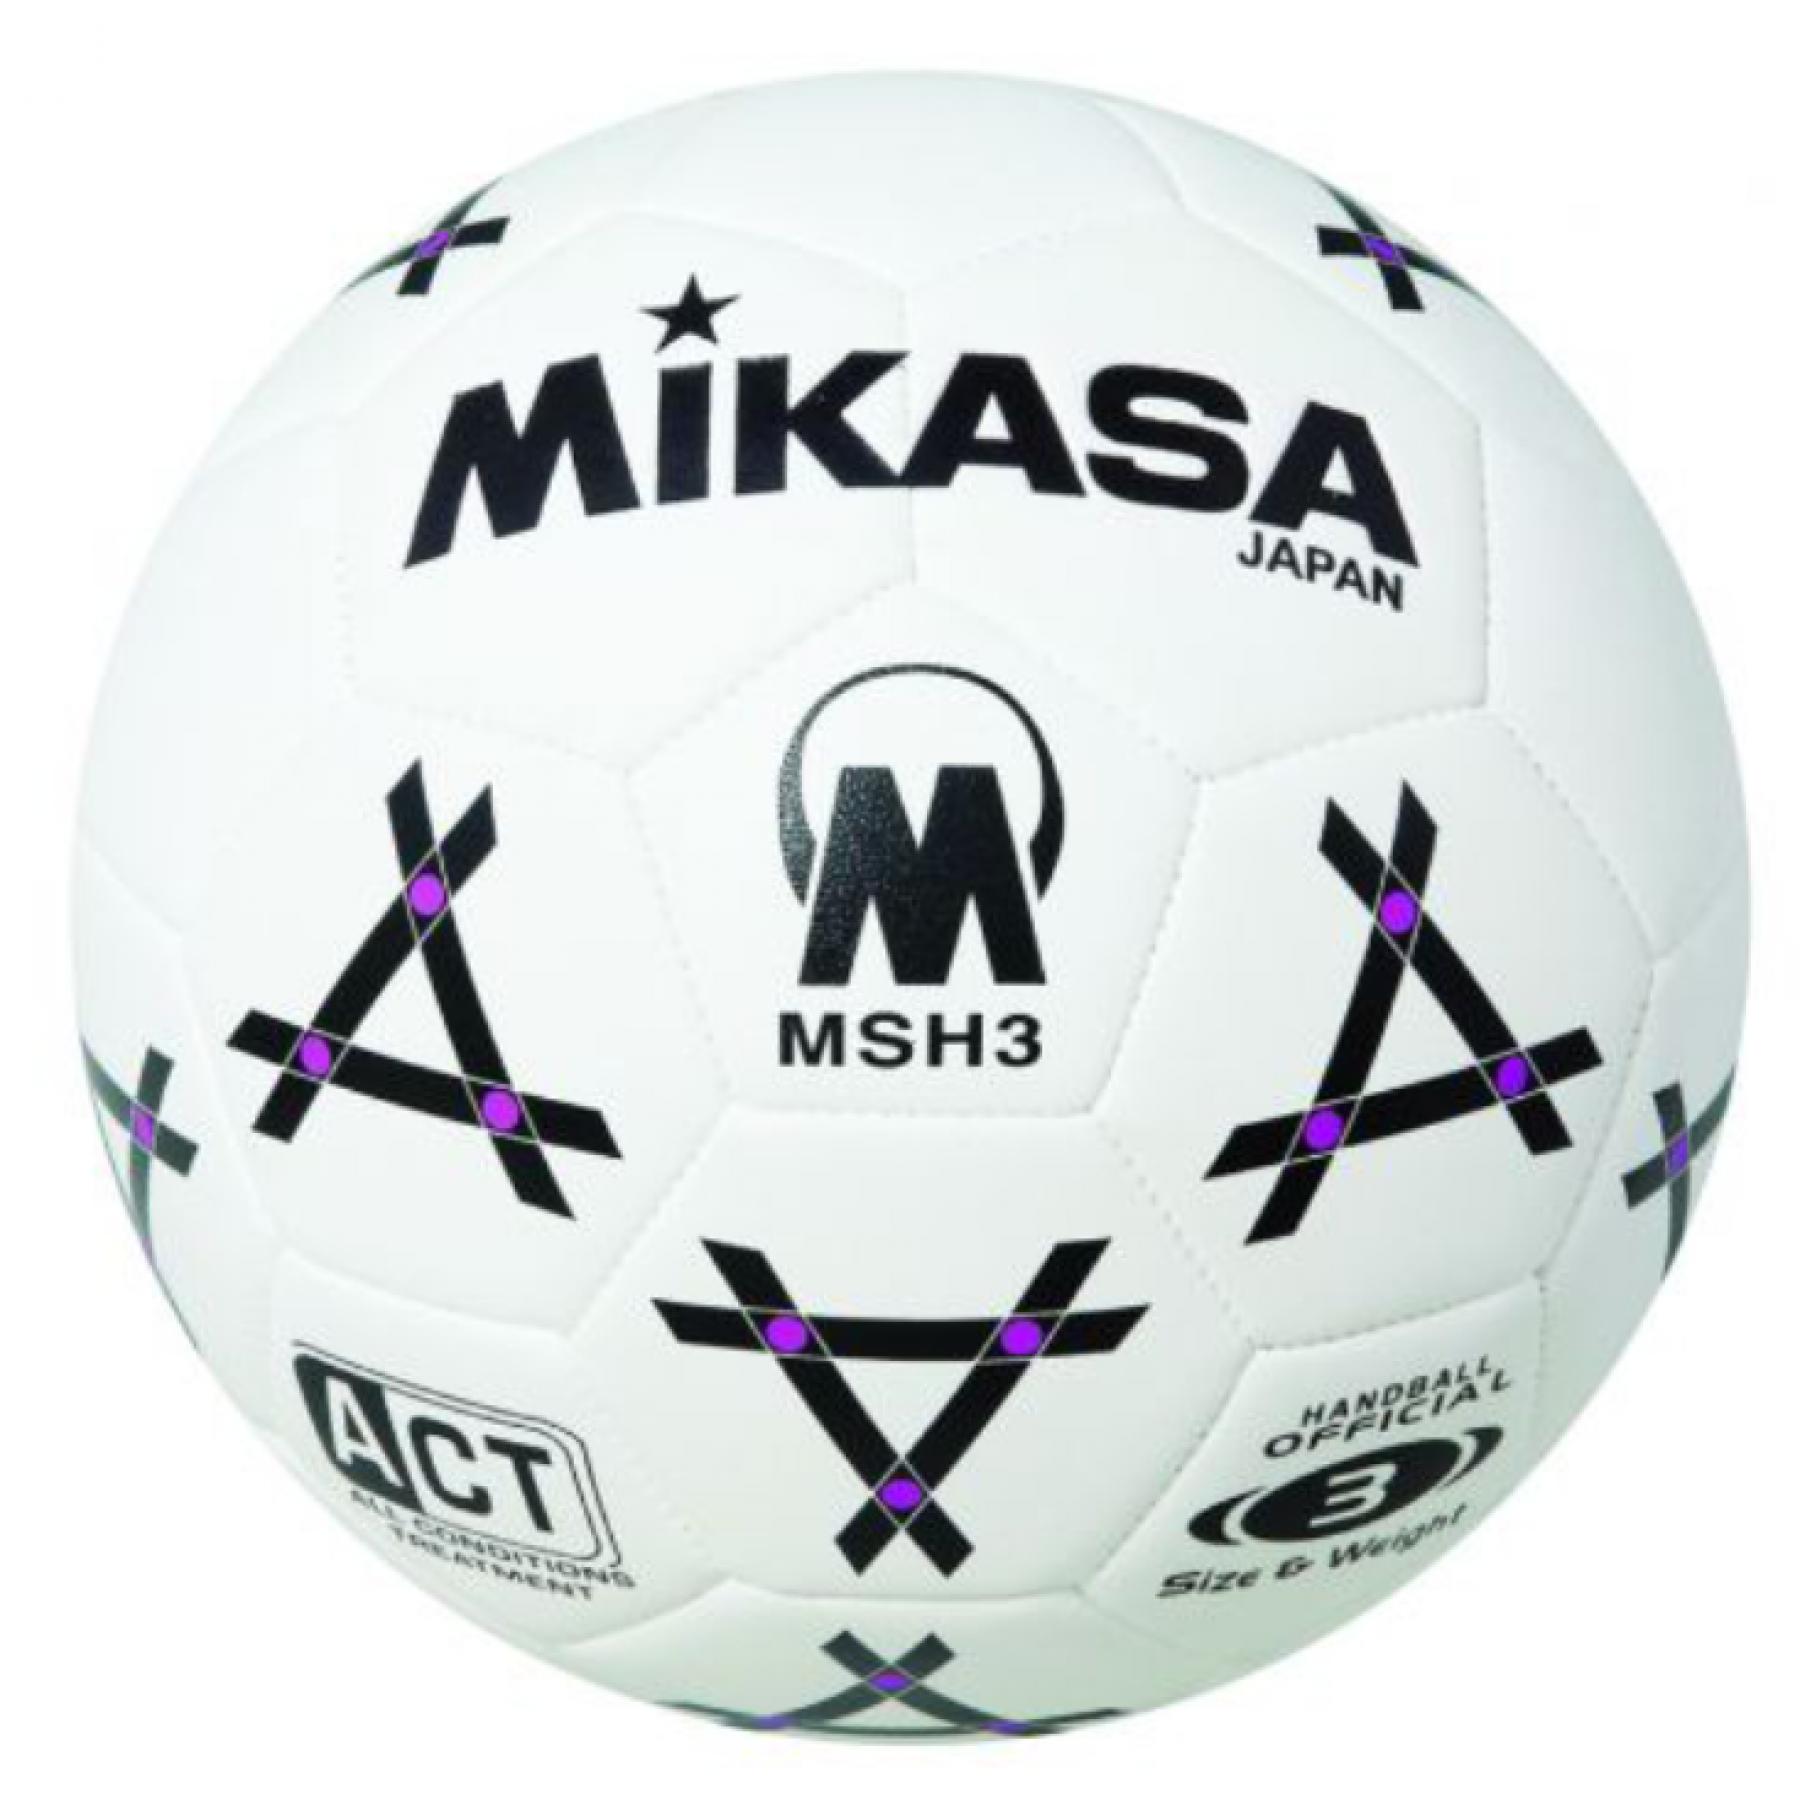 Mikasa Msh3 Handball